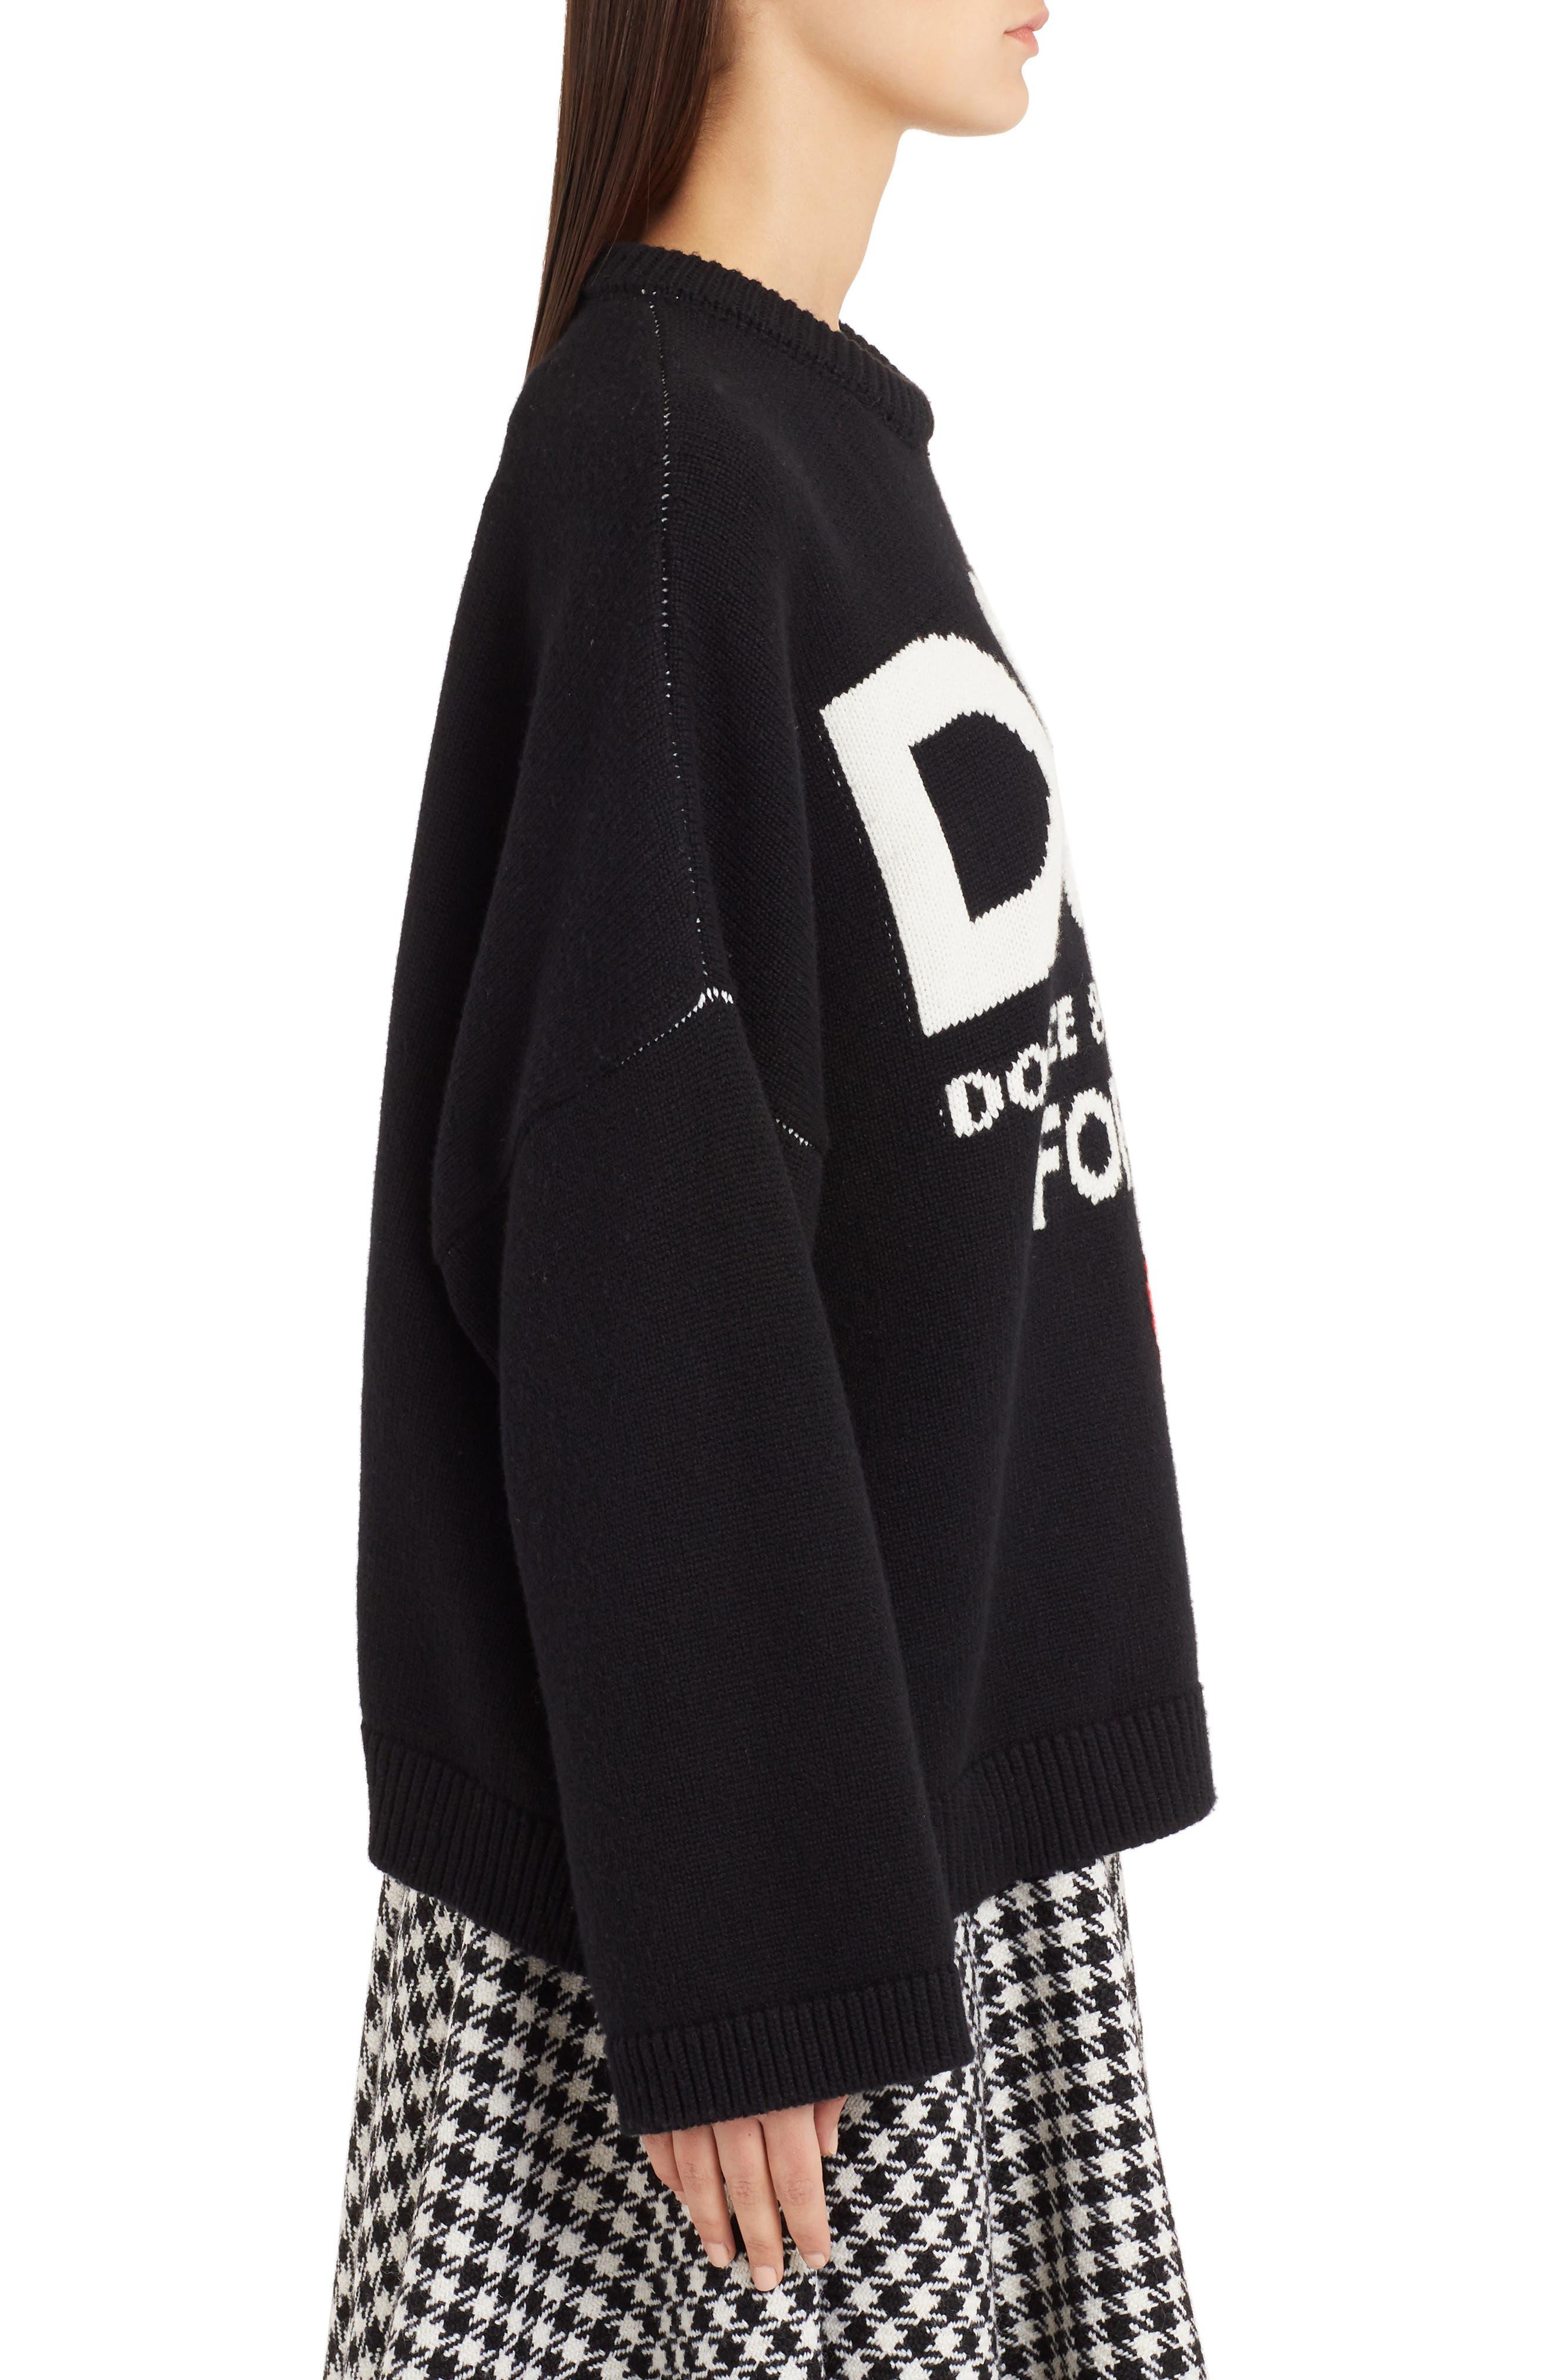 DOLCE&GABBANA,                             Intarsia Logo Cashmere Sweater,                             Alternate thumbnail 3, color,                             BLACK